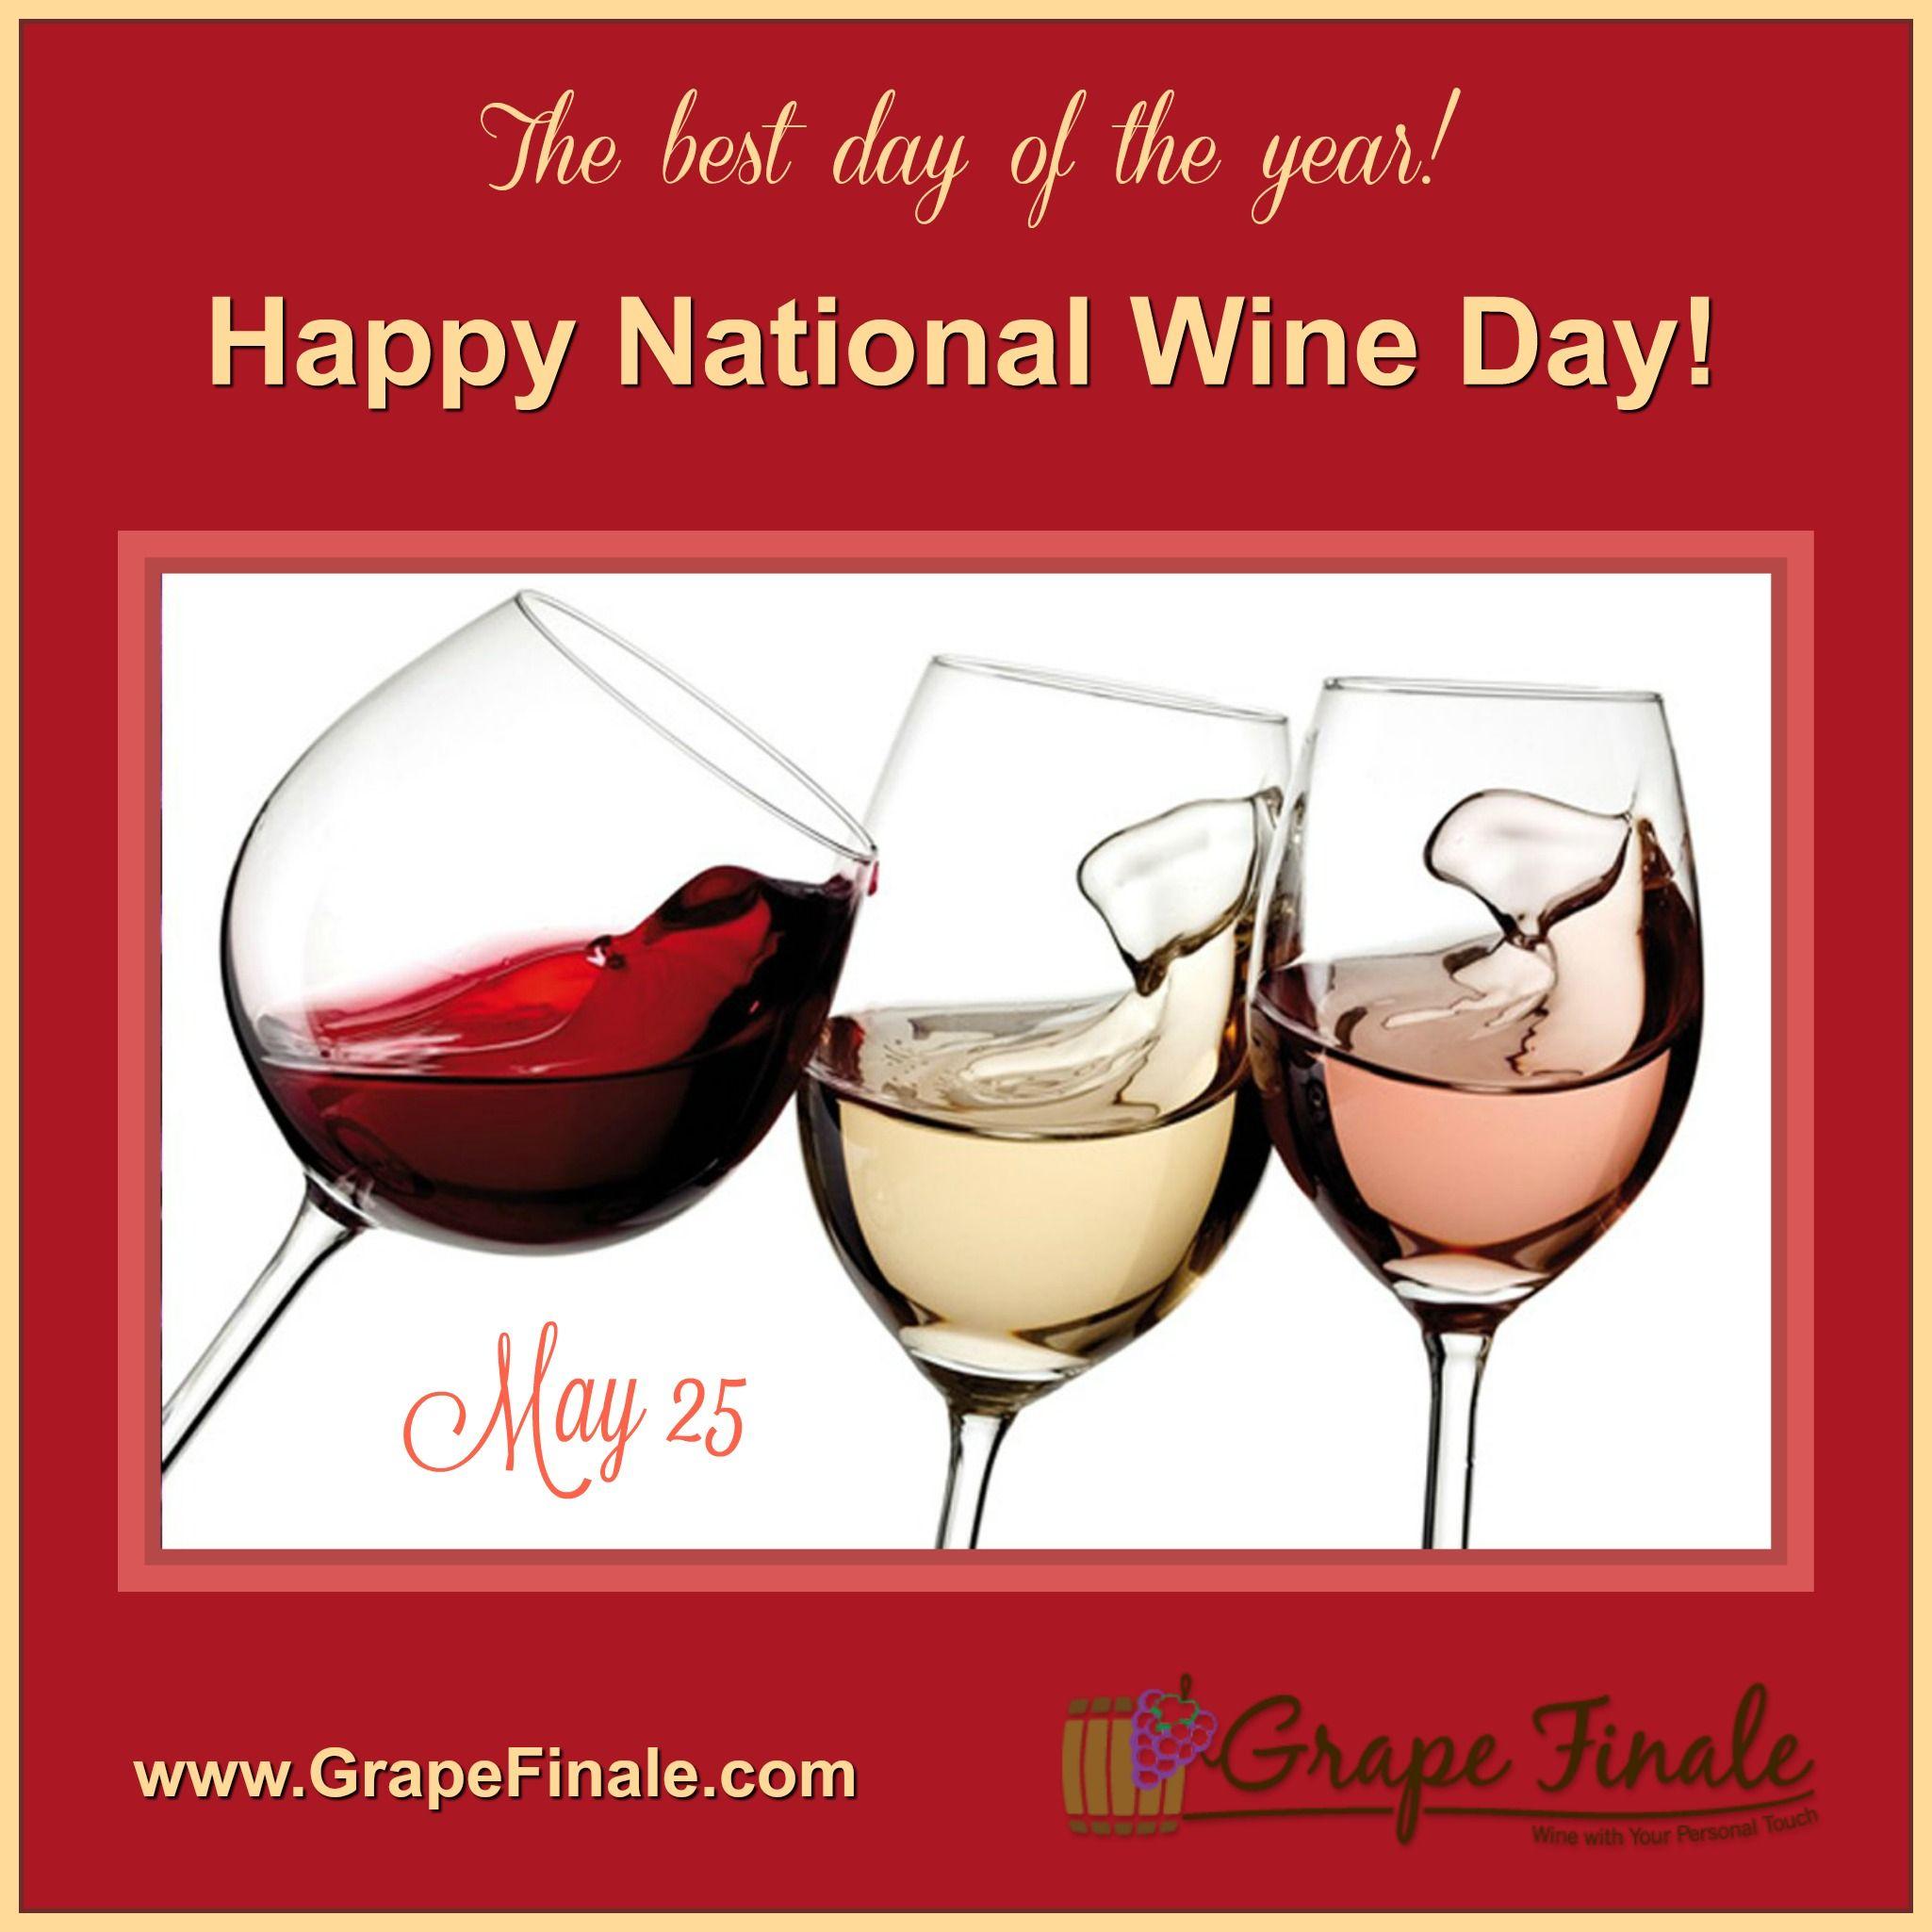 Nationalwineday Grapefinale Wine Winemaking Winemaker Makewine Makeyourownwine Winelover Redwine Winetasting Winery Wineries Grape Uses Wine Grapes